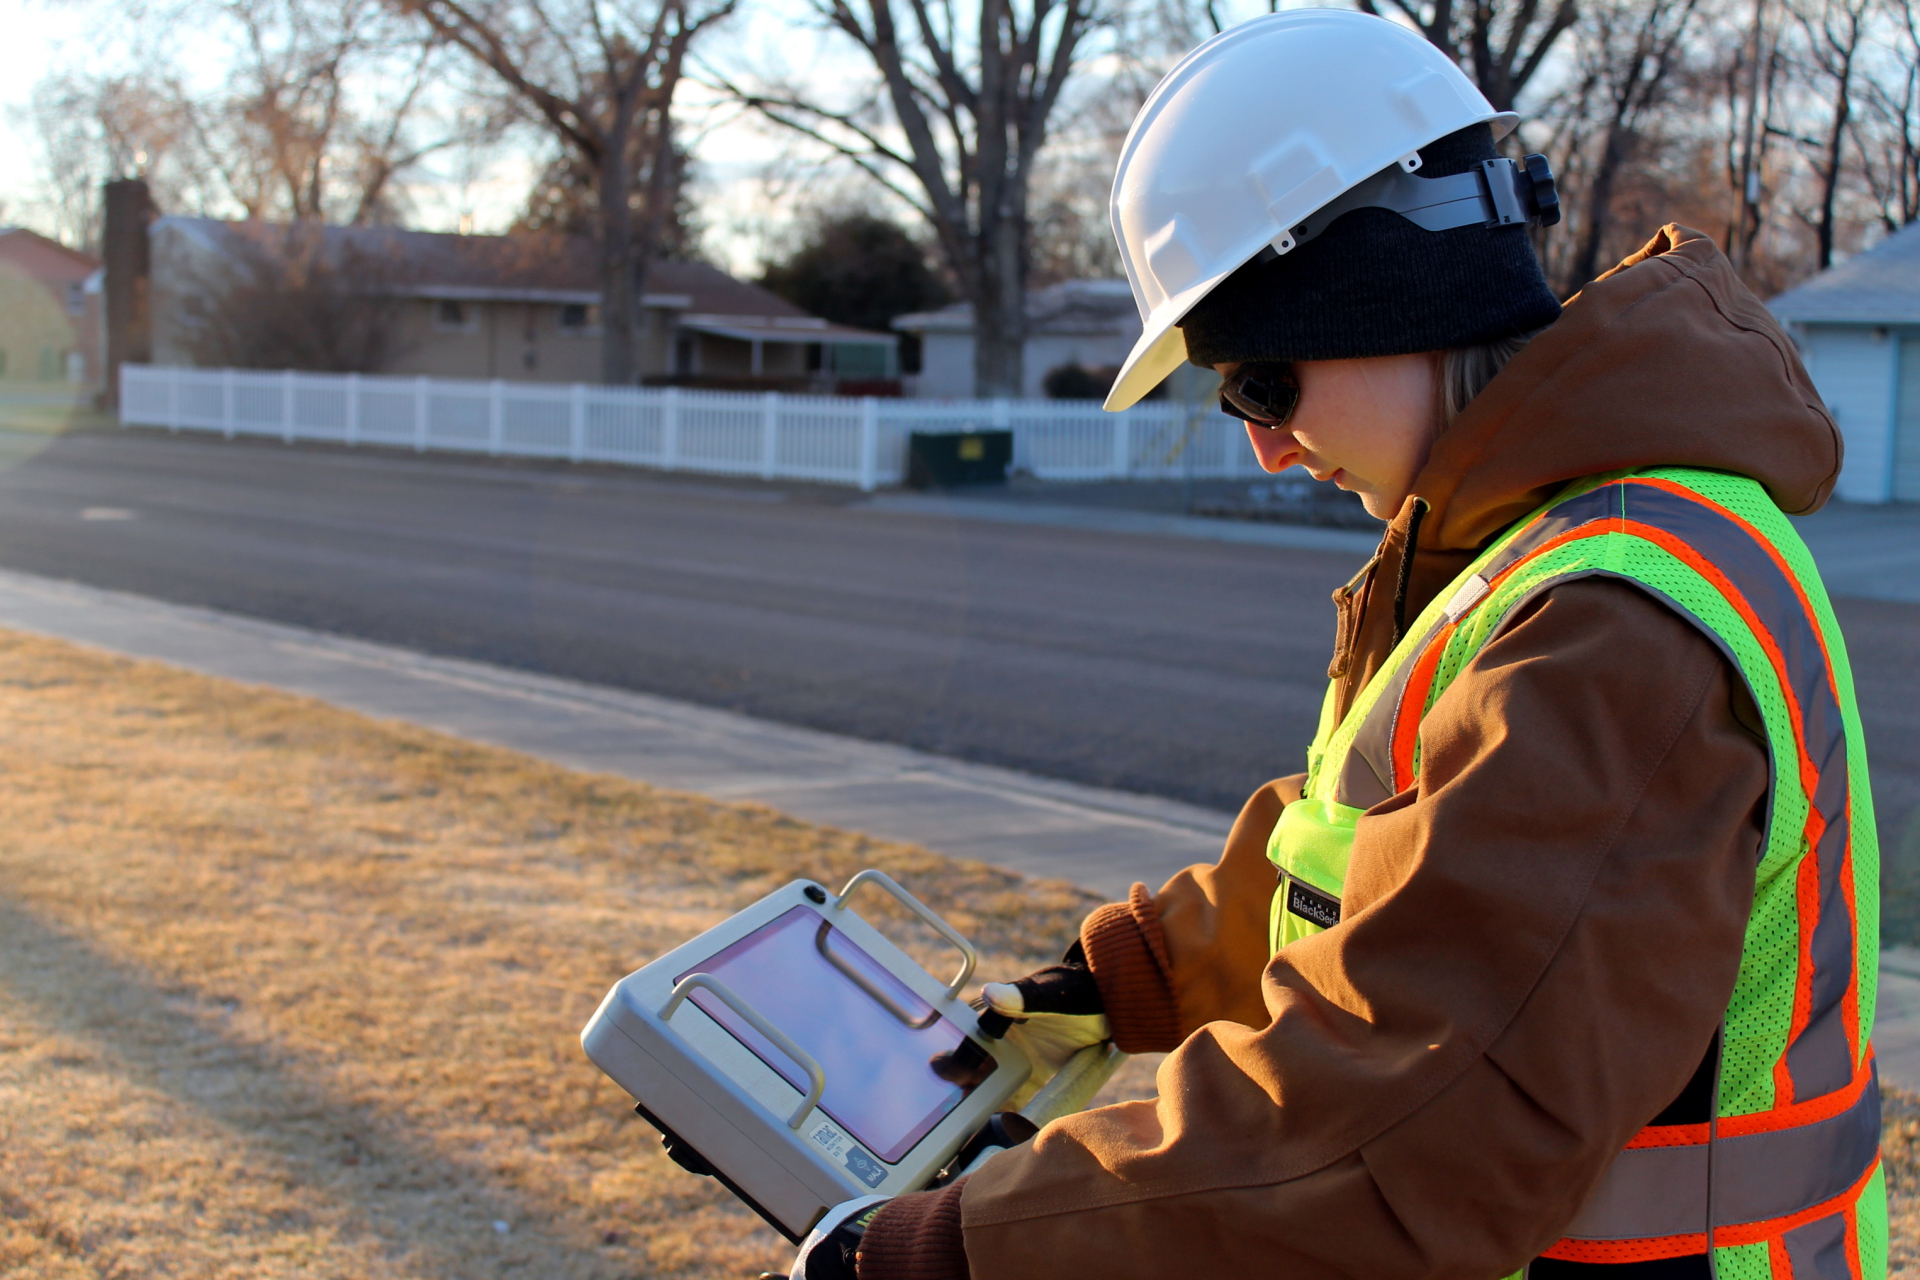 Wyoming GPR Utility Line Locate